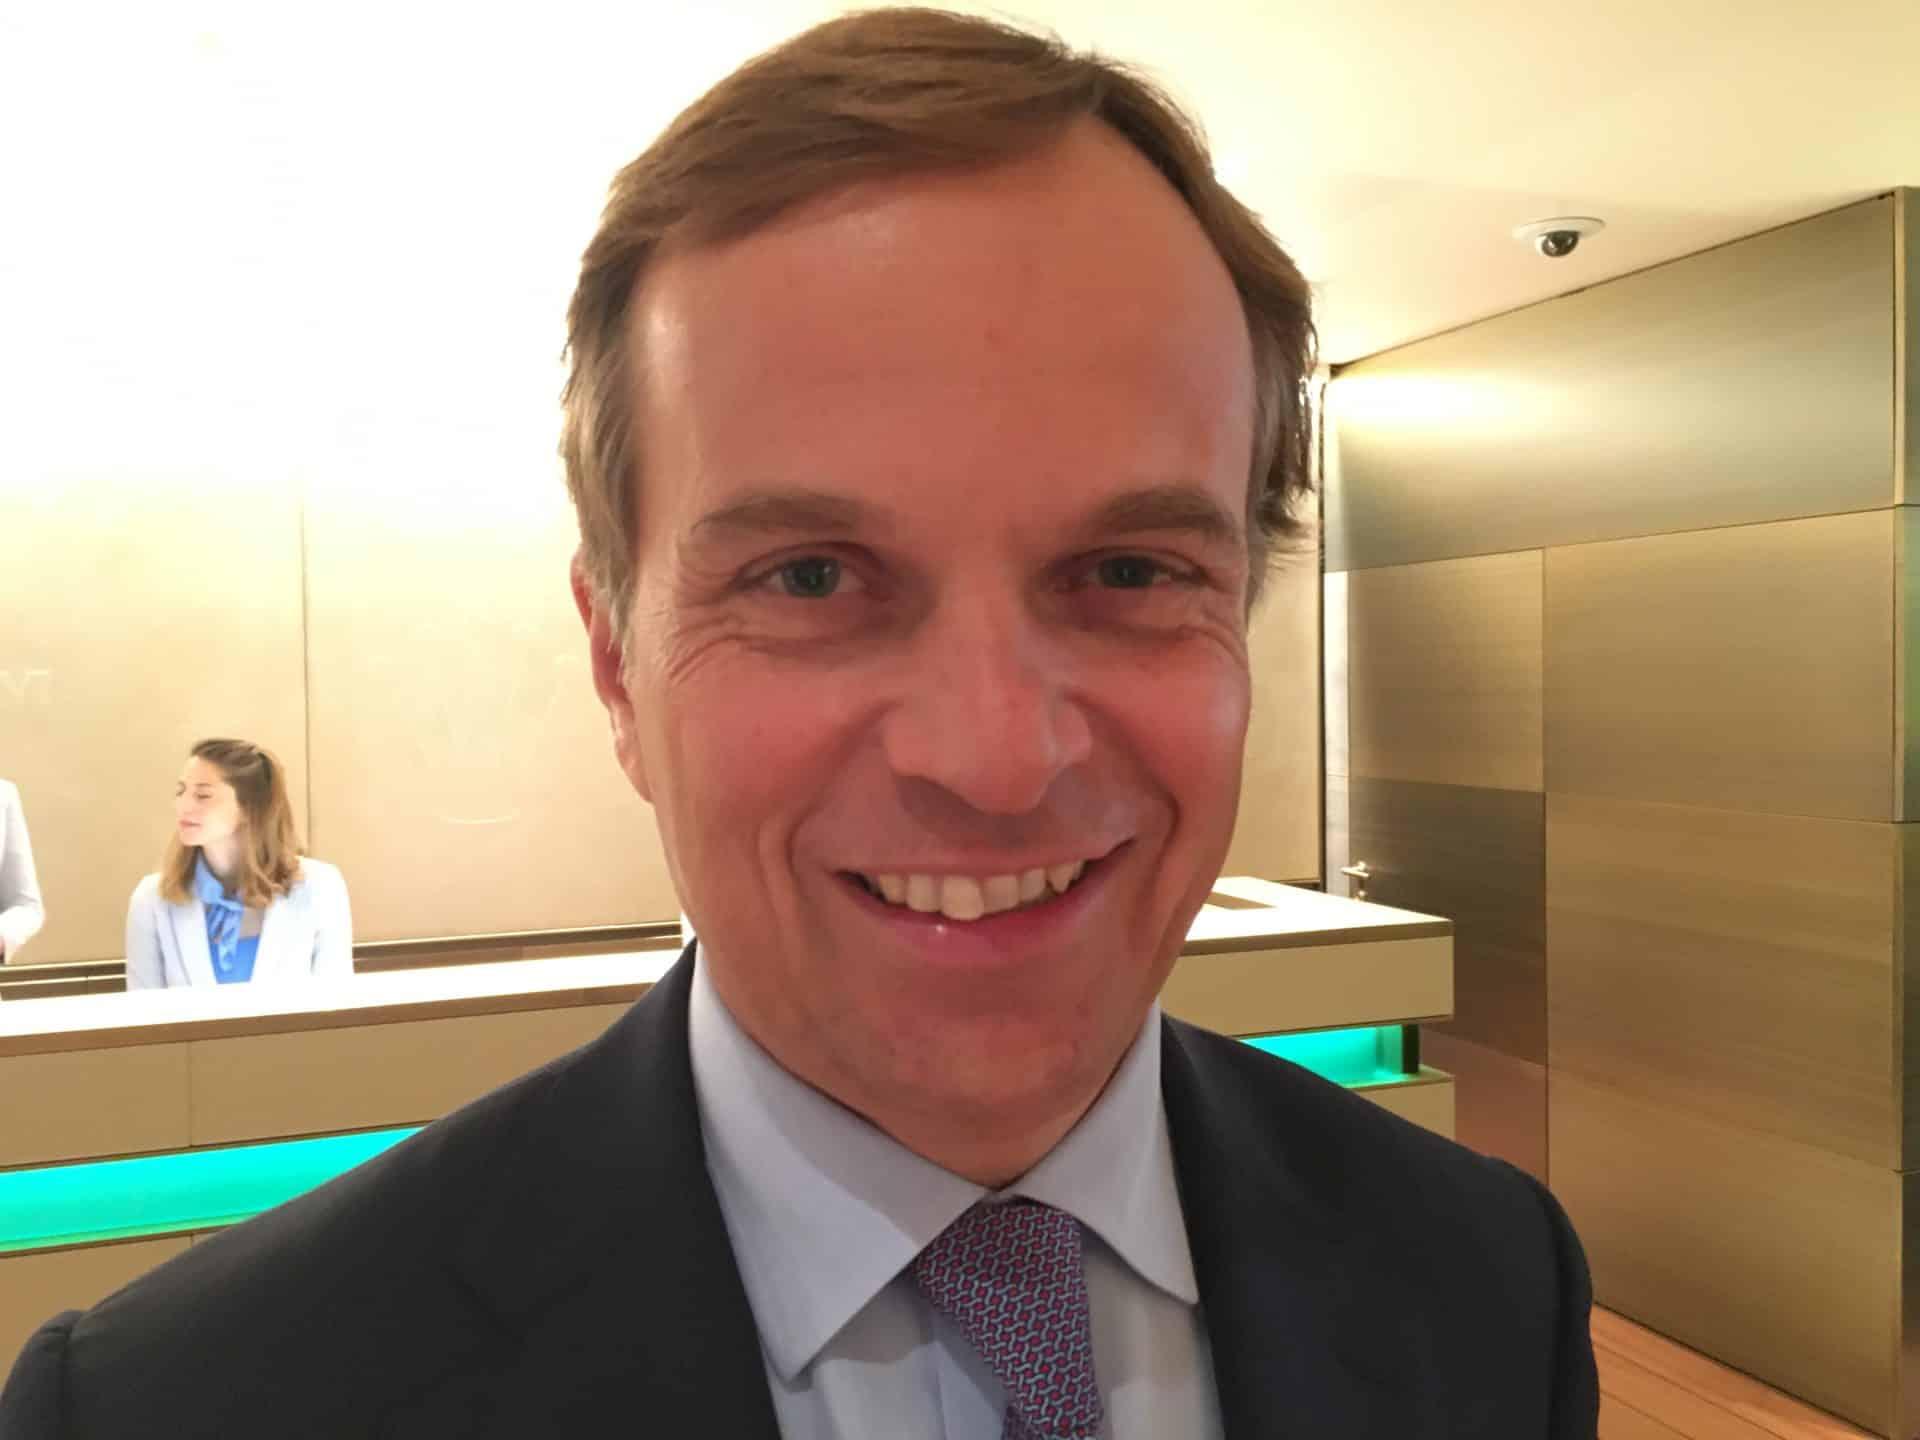 Jean-Frédéric Dufour, seit Juni 2015 CEO von Rolex CEO